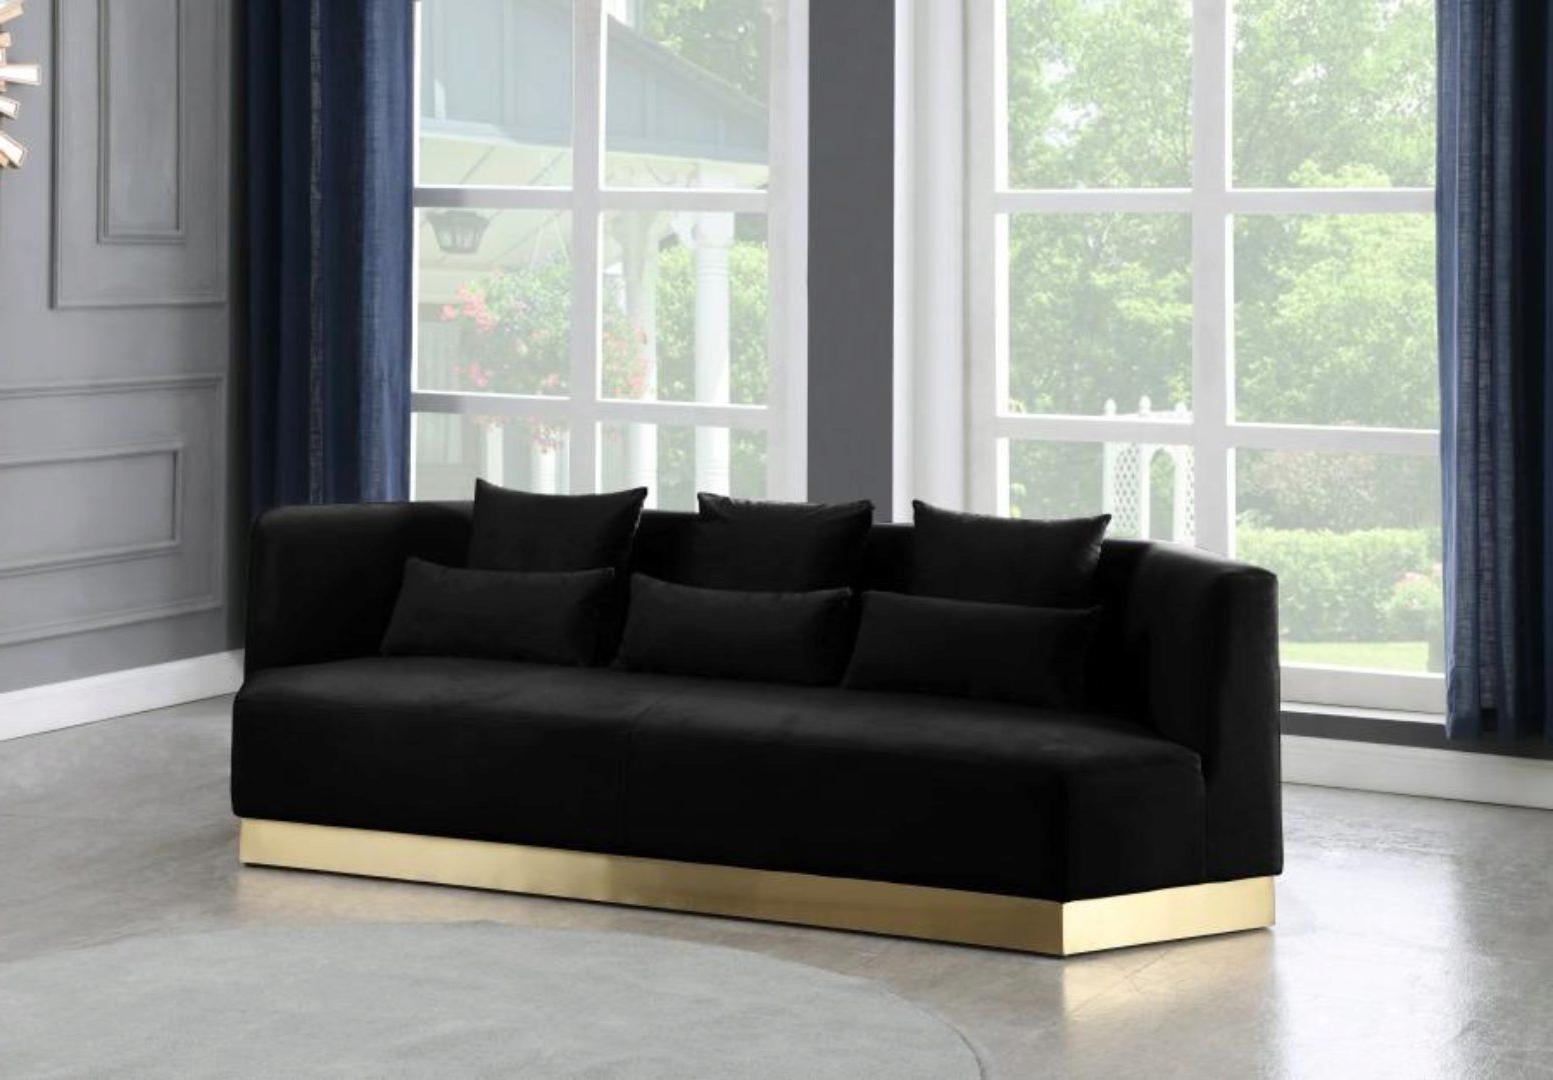 Strummer Velvet Sectional Sofas In Well Known Black Velvet Sofa Curved Design Contemporary Meridian (View 7 of 20)